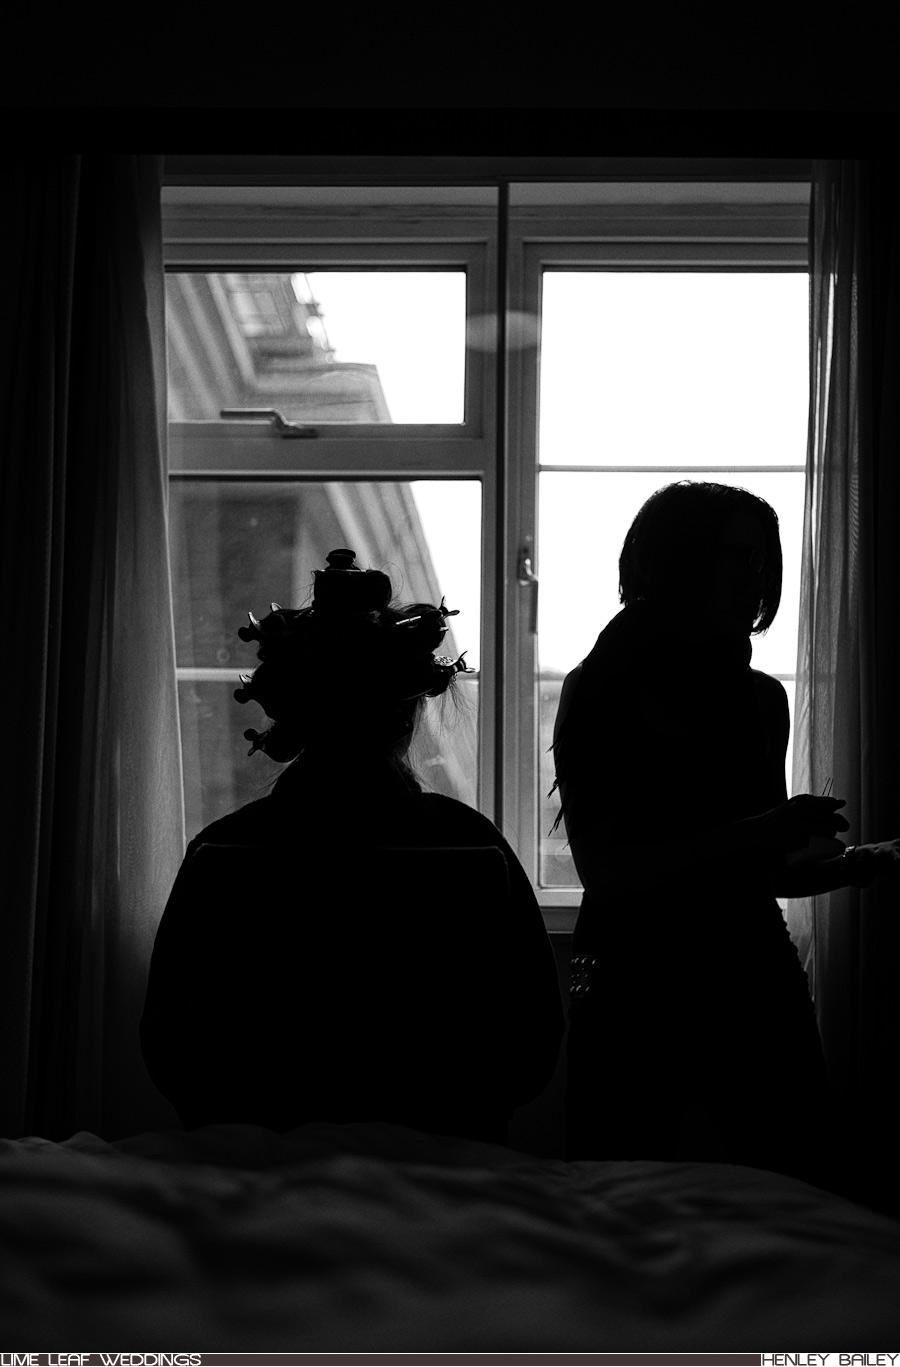 Silhouette of Jane by window